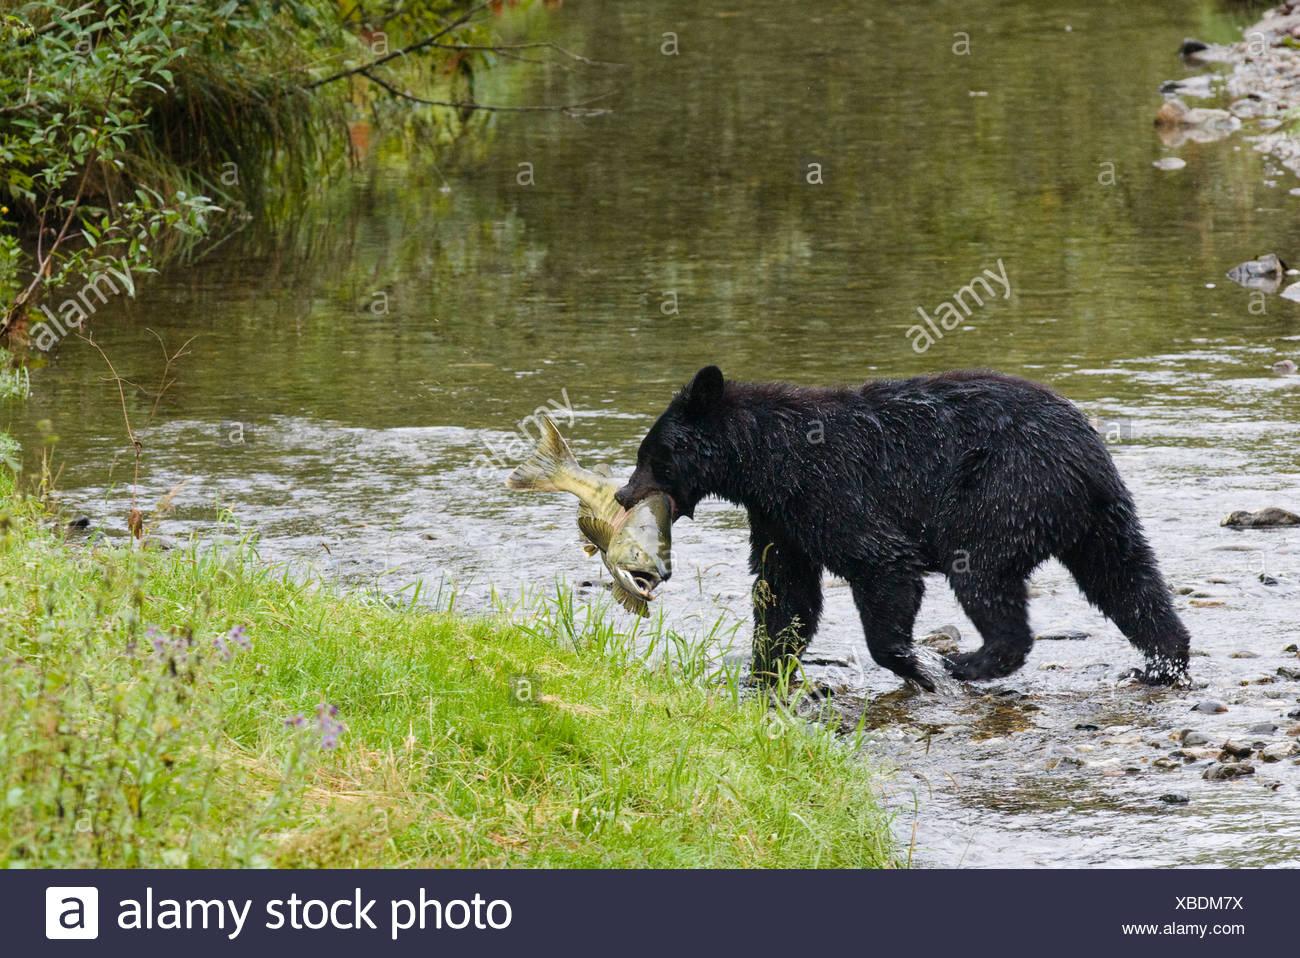 Adult Black bear (Ursus americanus) with Chum salmon it has just caught, Fish Creek, Tongass National Forest, Alaska, USA - Stock Image